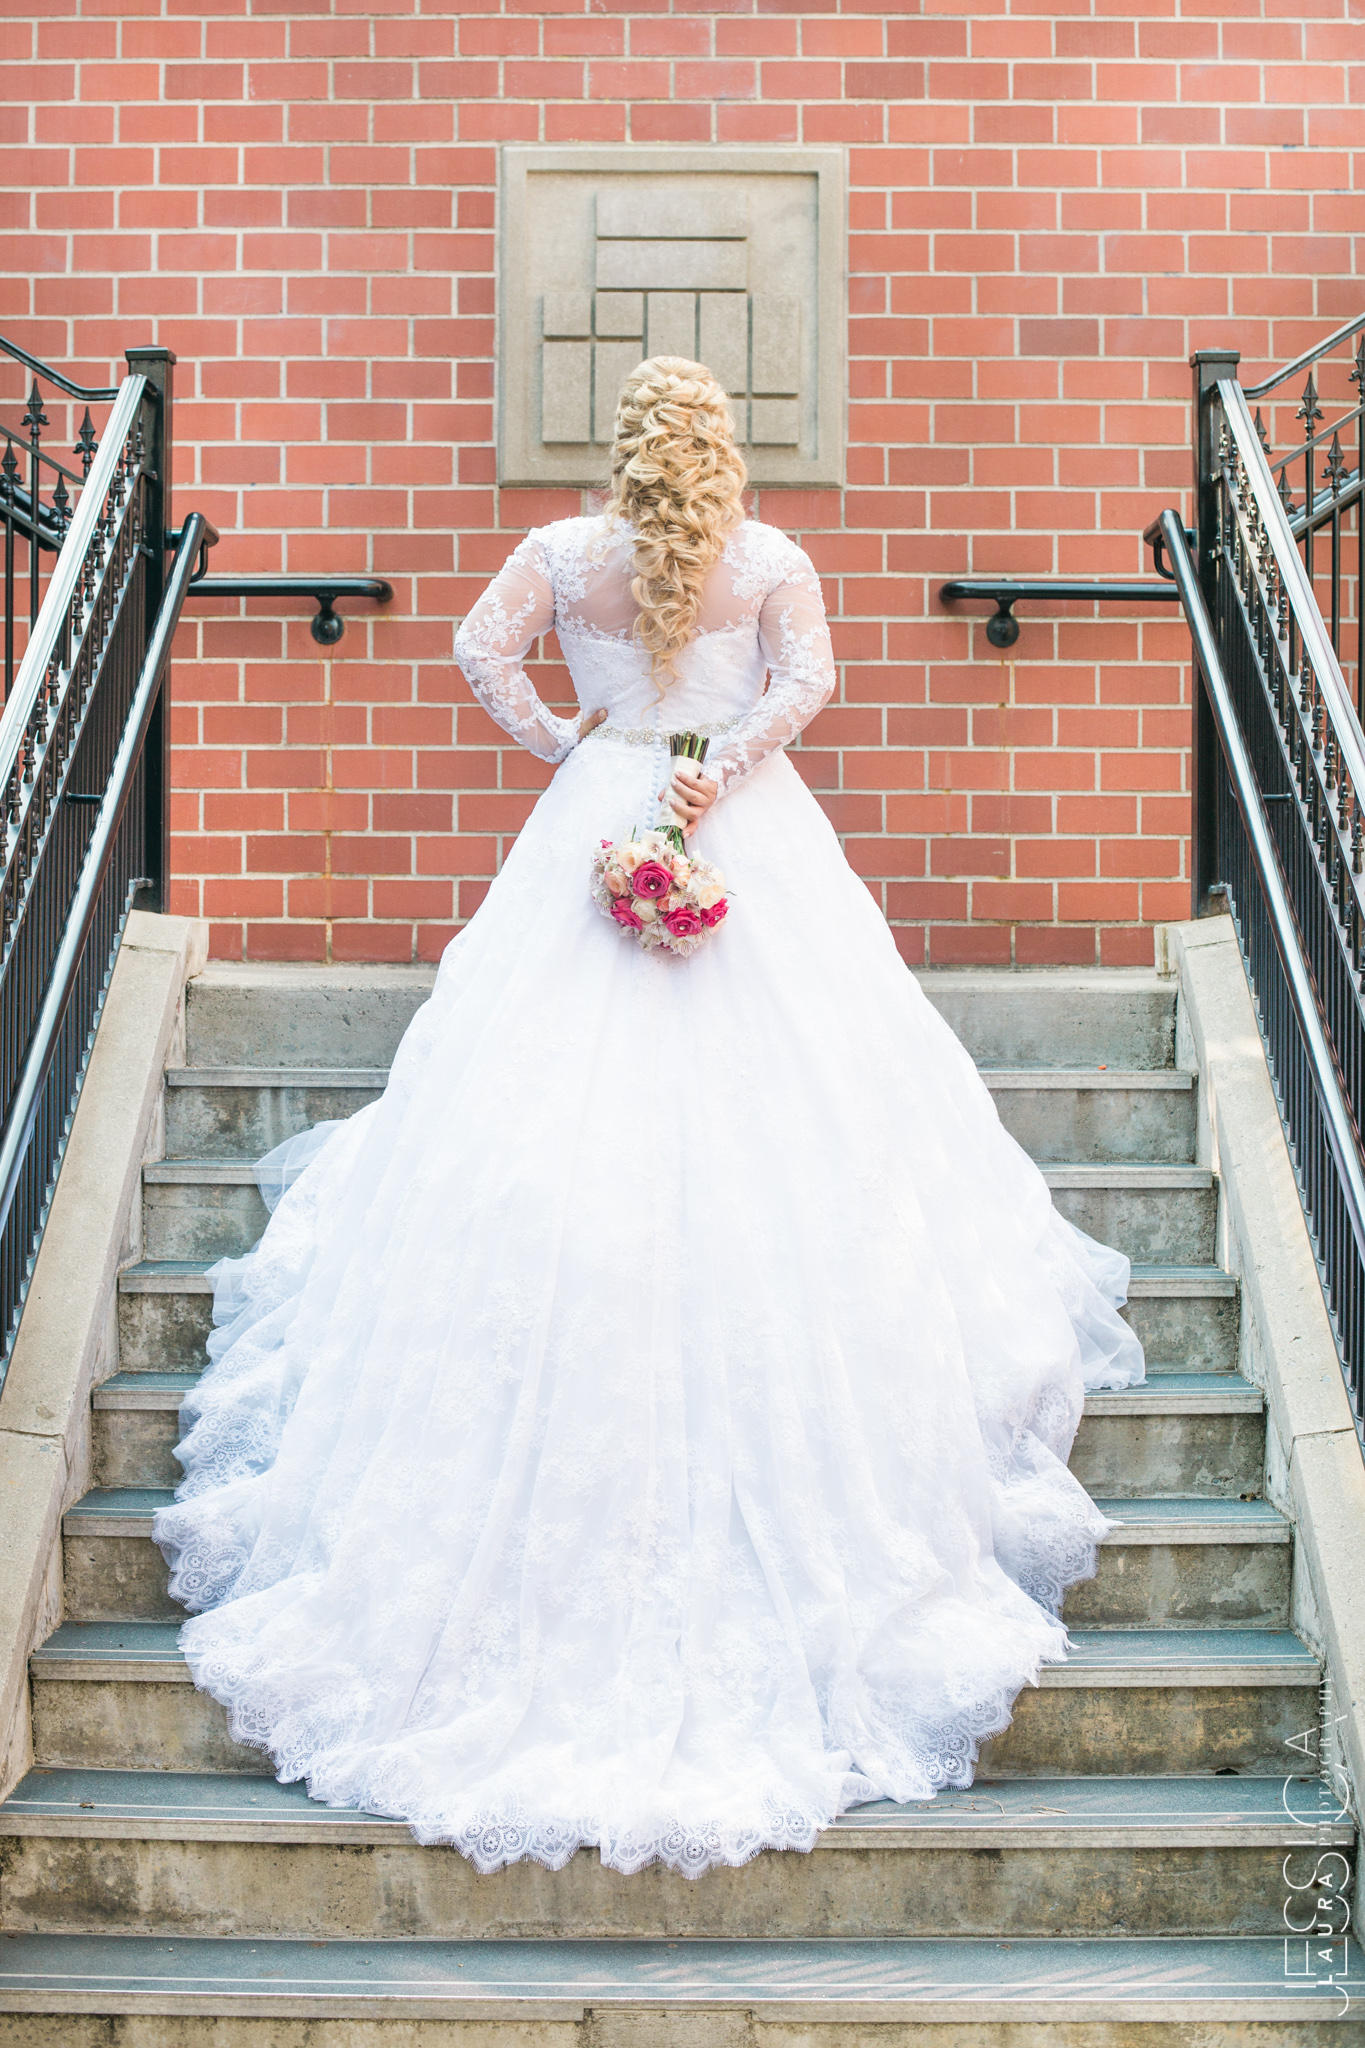 Eugene-Maryana_wedding_08062017_web (168 of 558).JPG